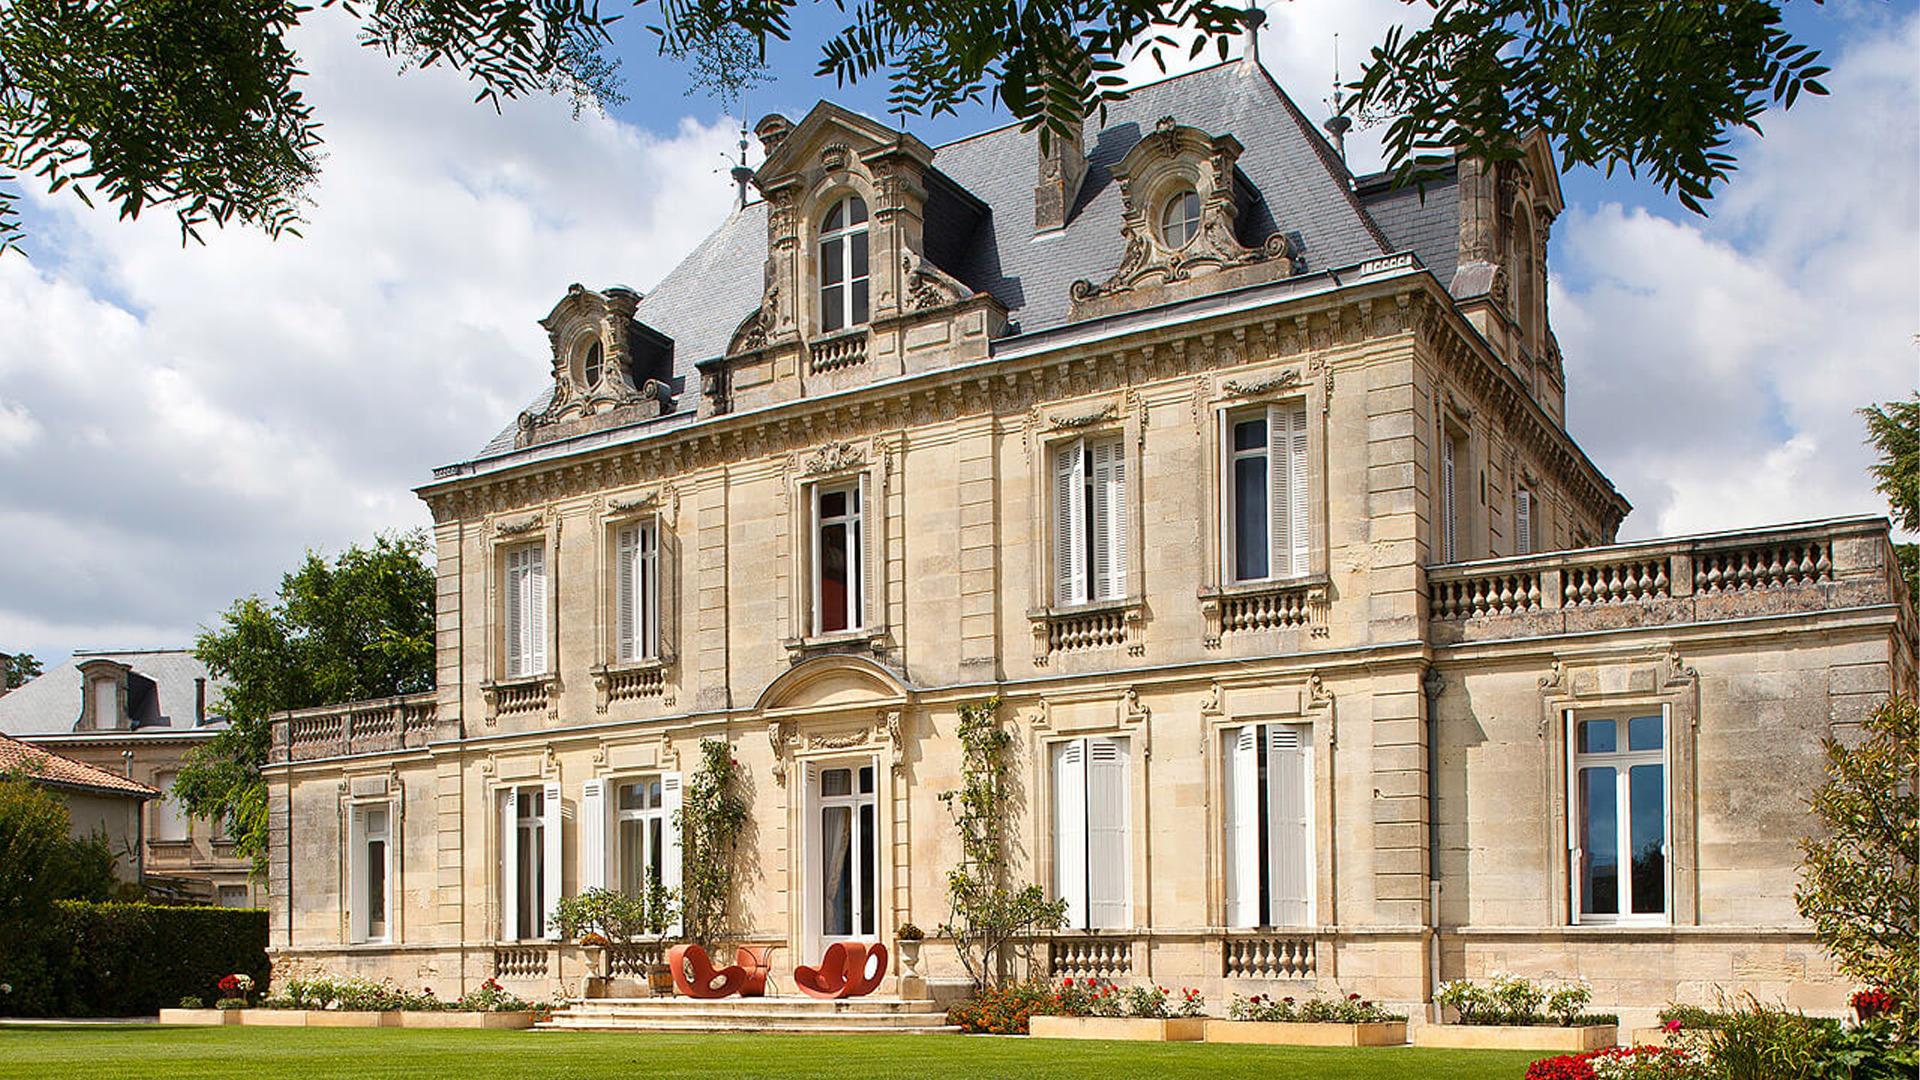 Rượu Vang Chateau Malescot-St-Exupery